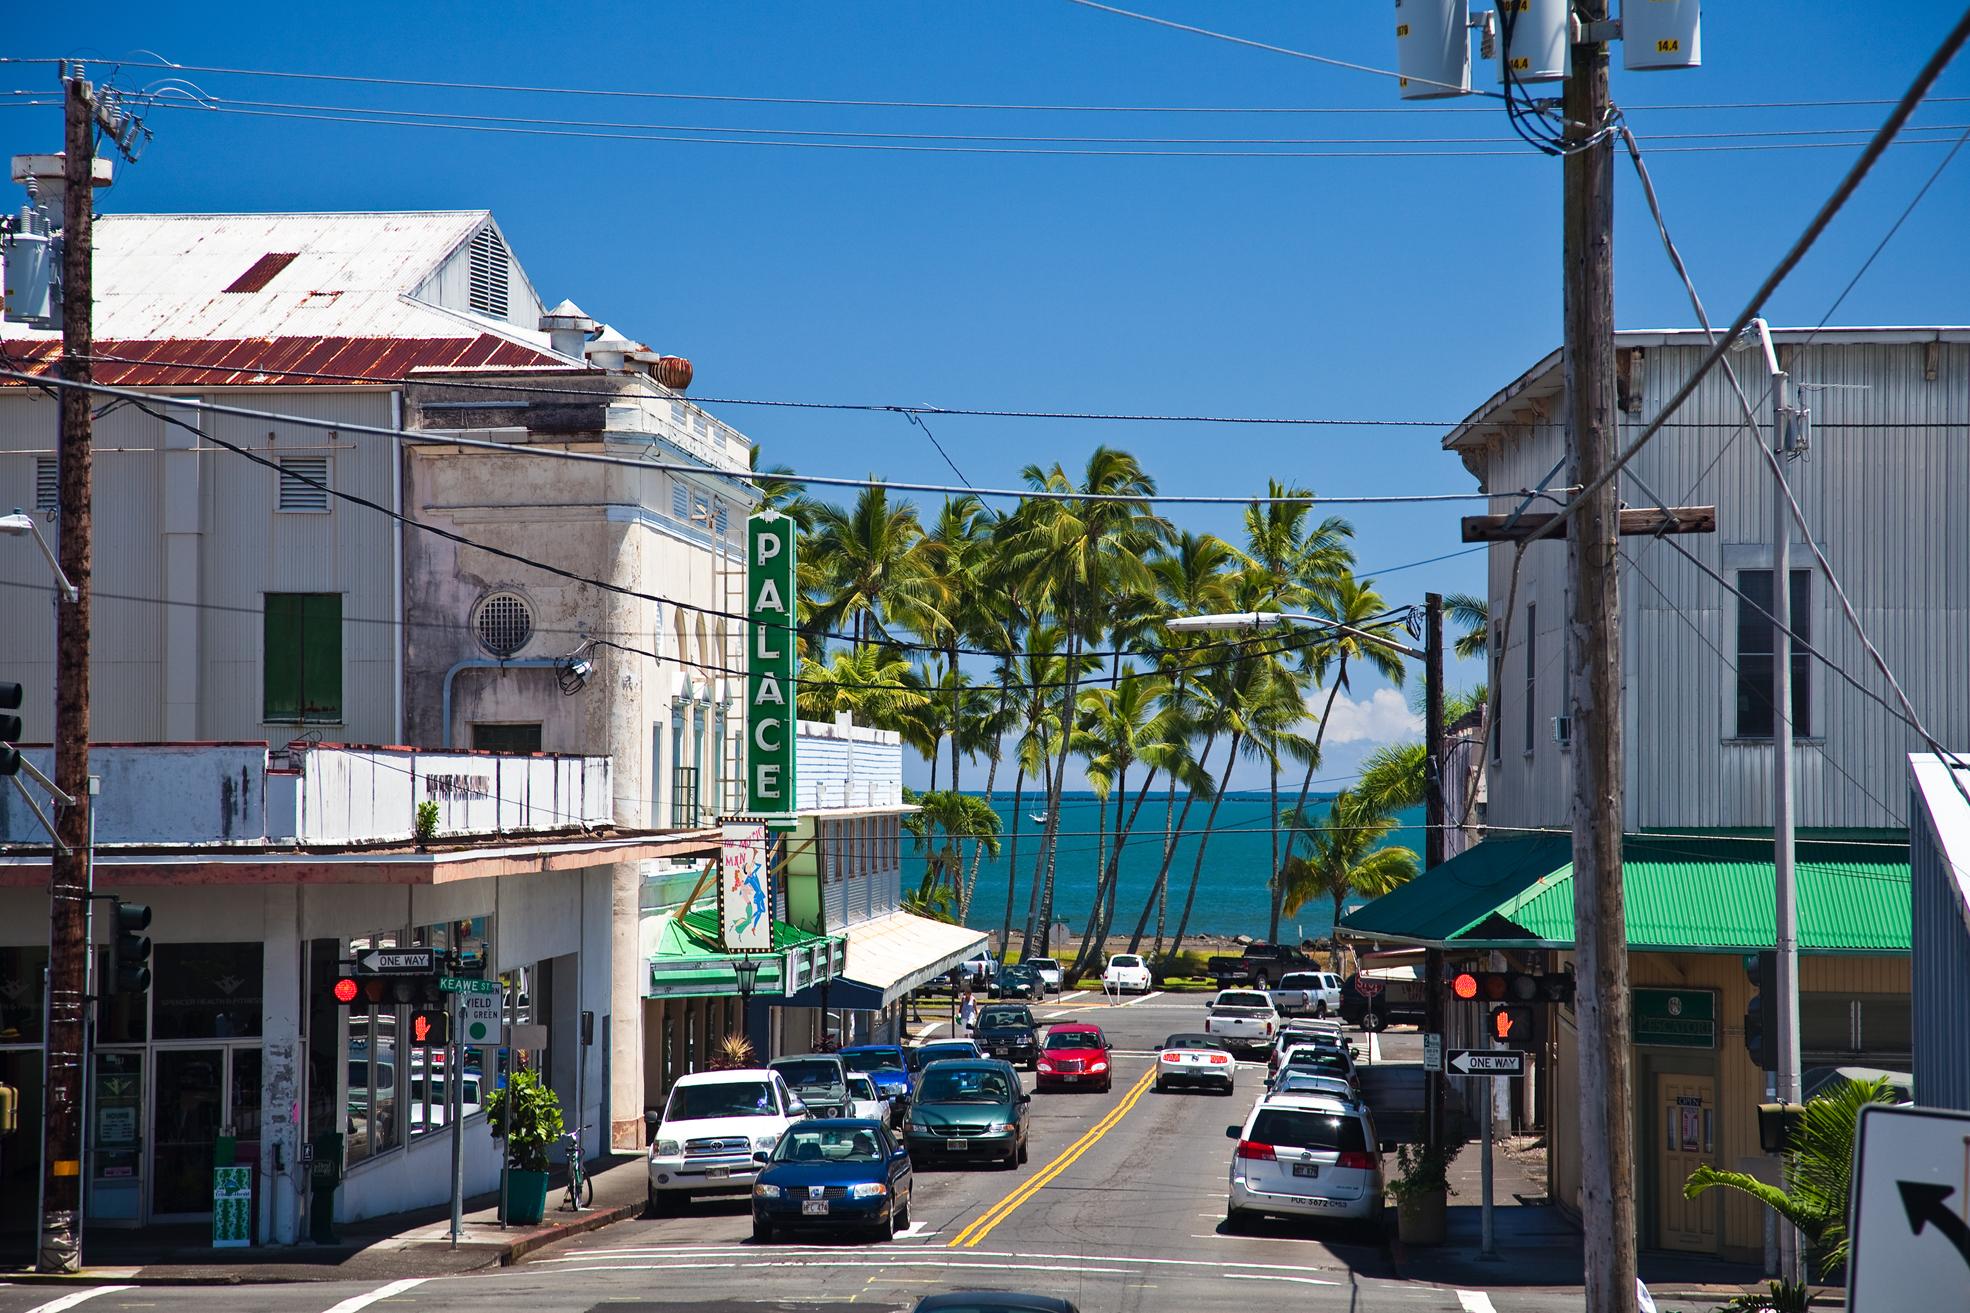 Old Hilo - Hawaii Tourism Authority (HTA) / Tor Johnson